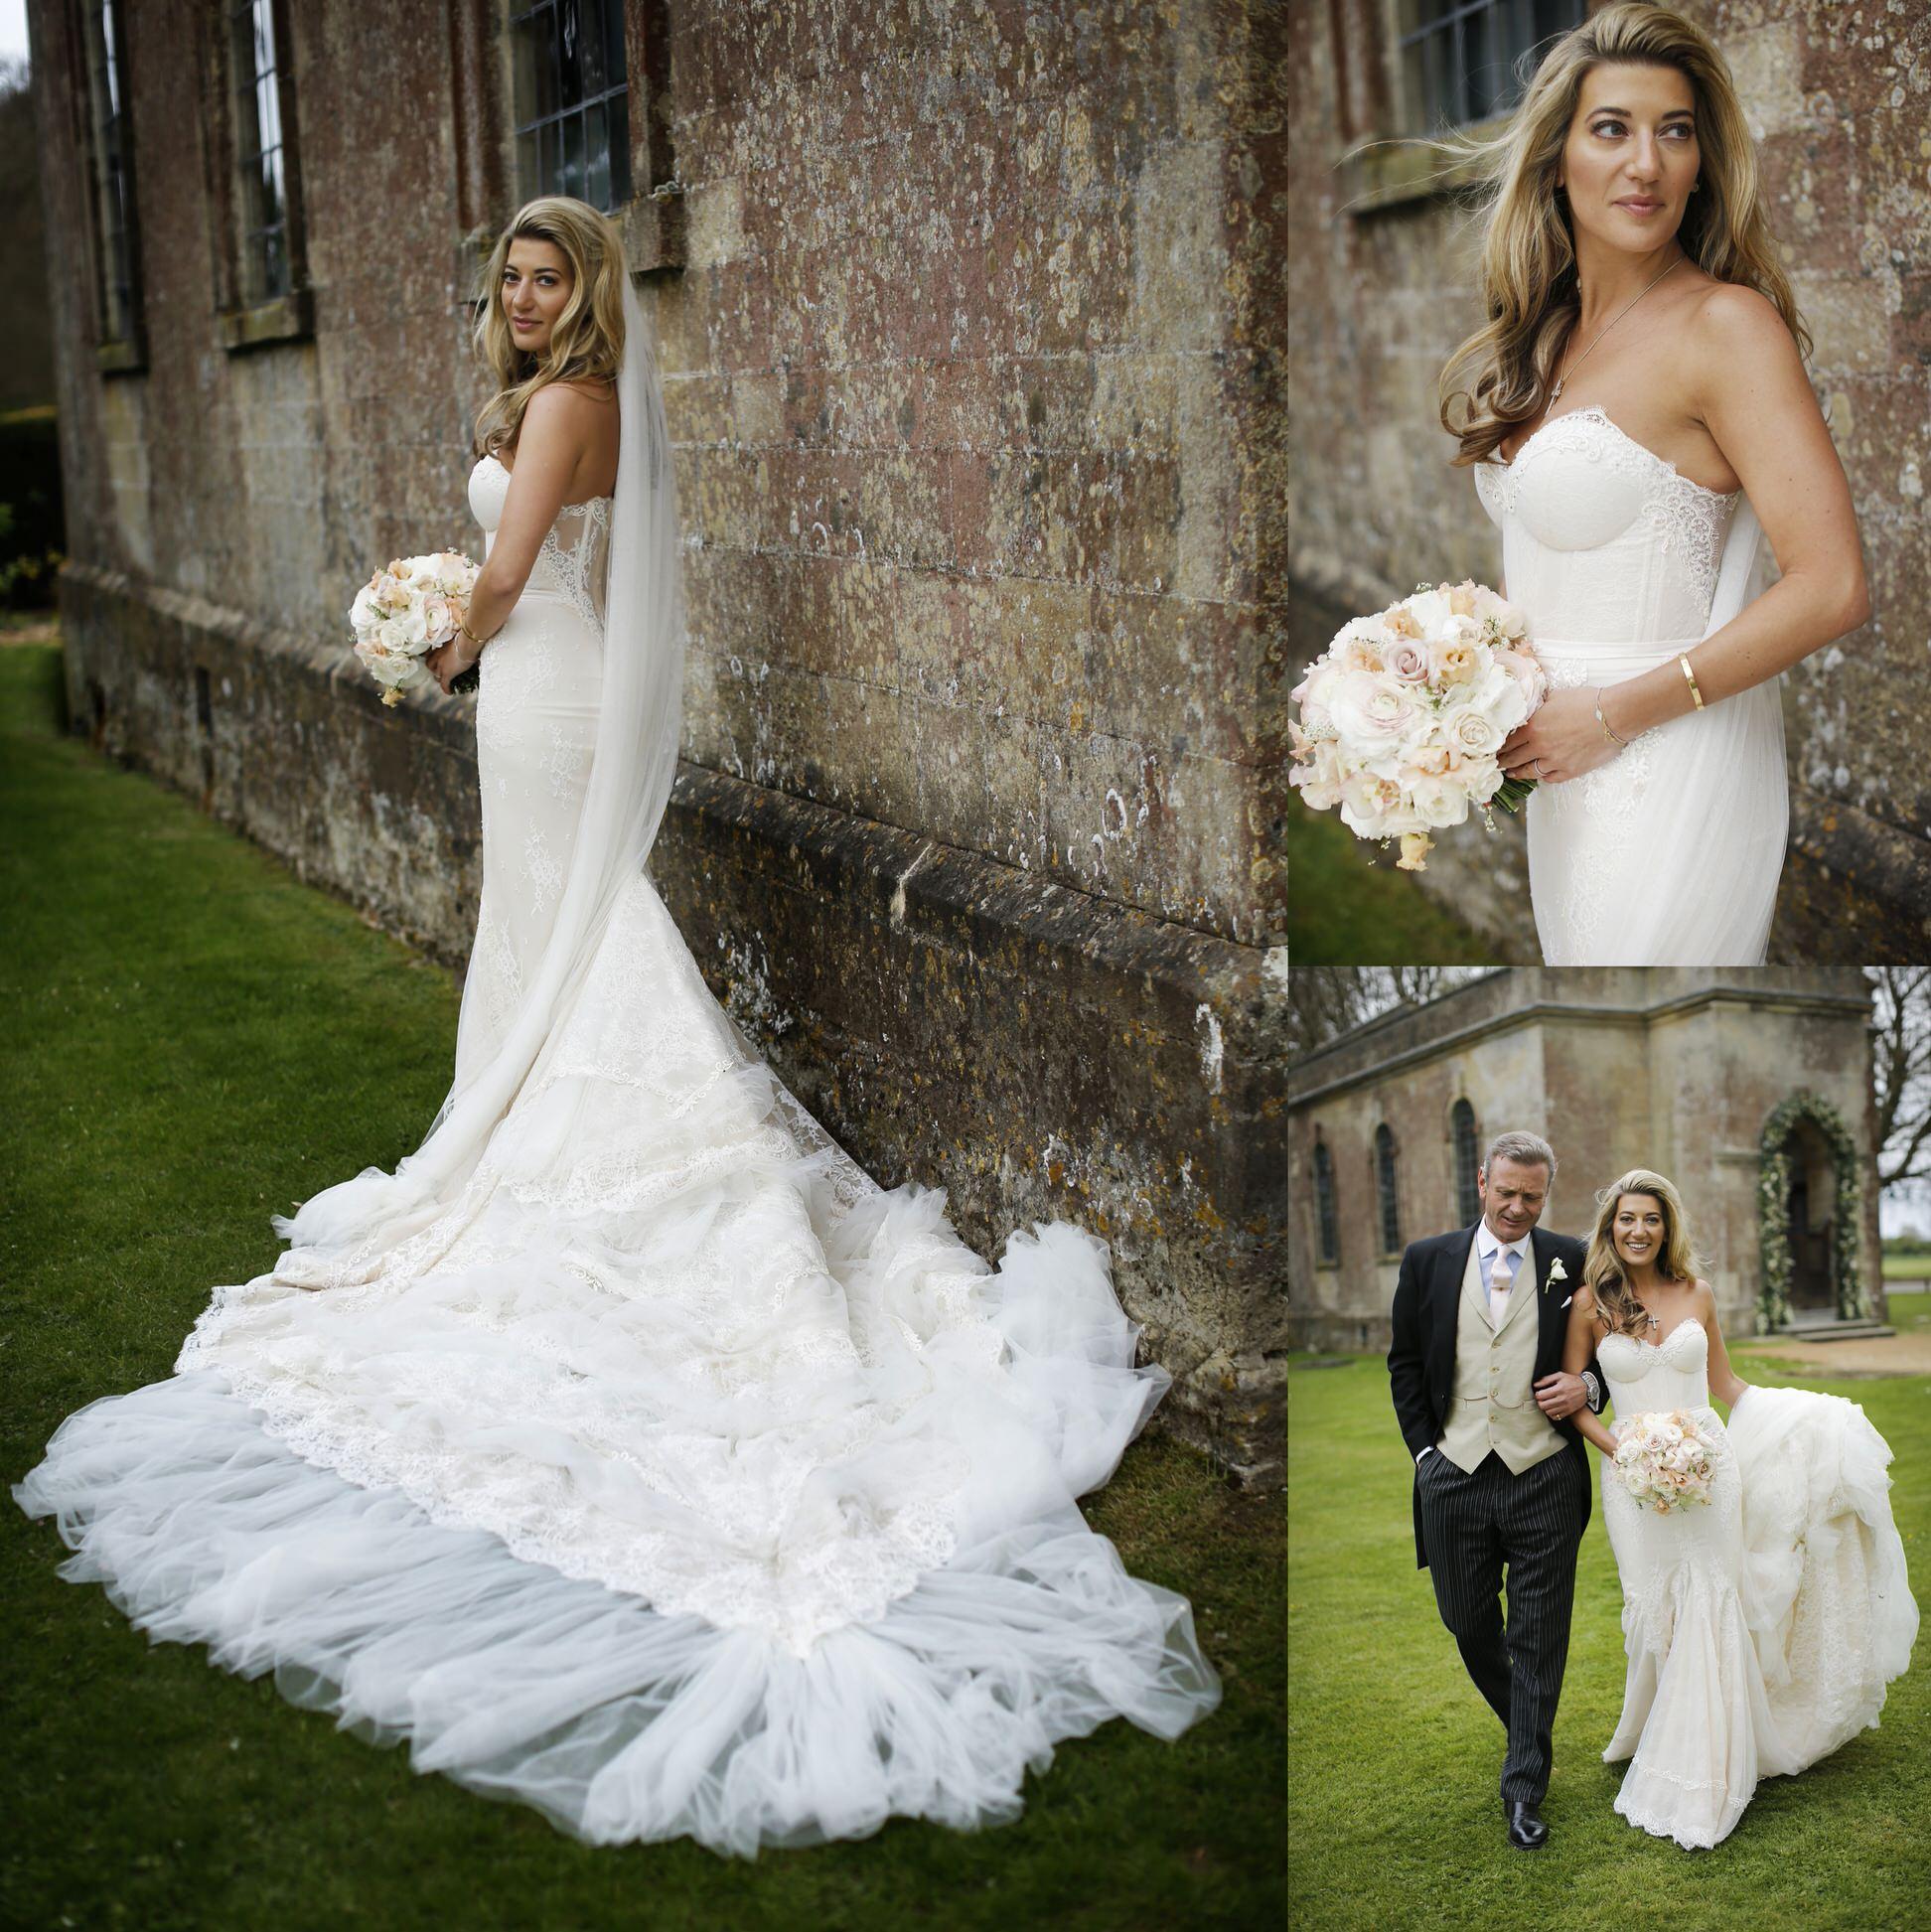 babington-house-wedding-at-soho-house-london-wedding-photographer_0015.jpg